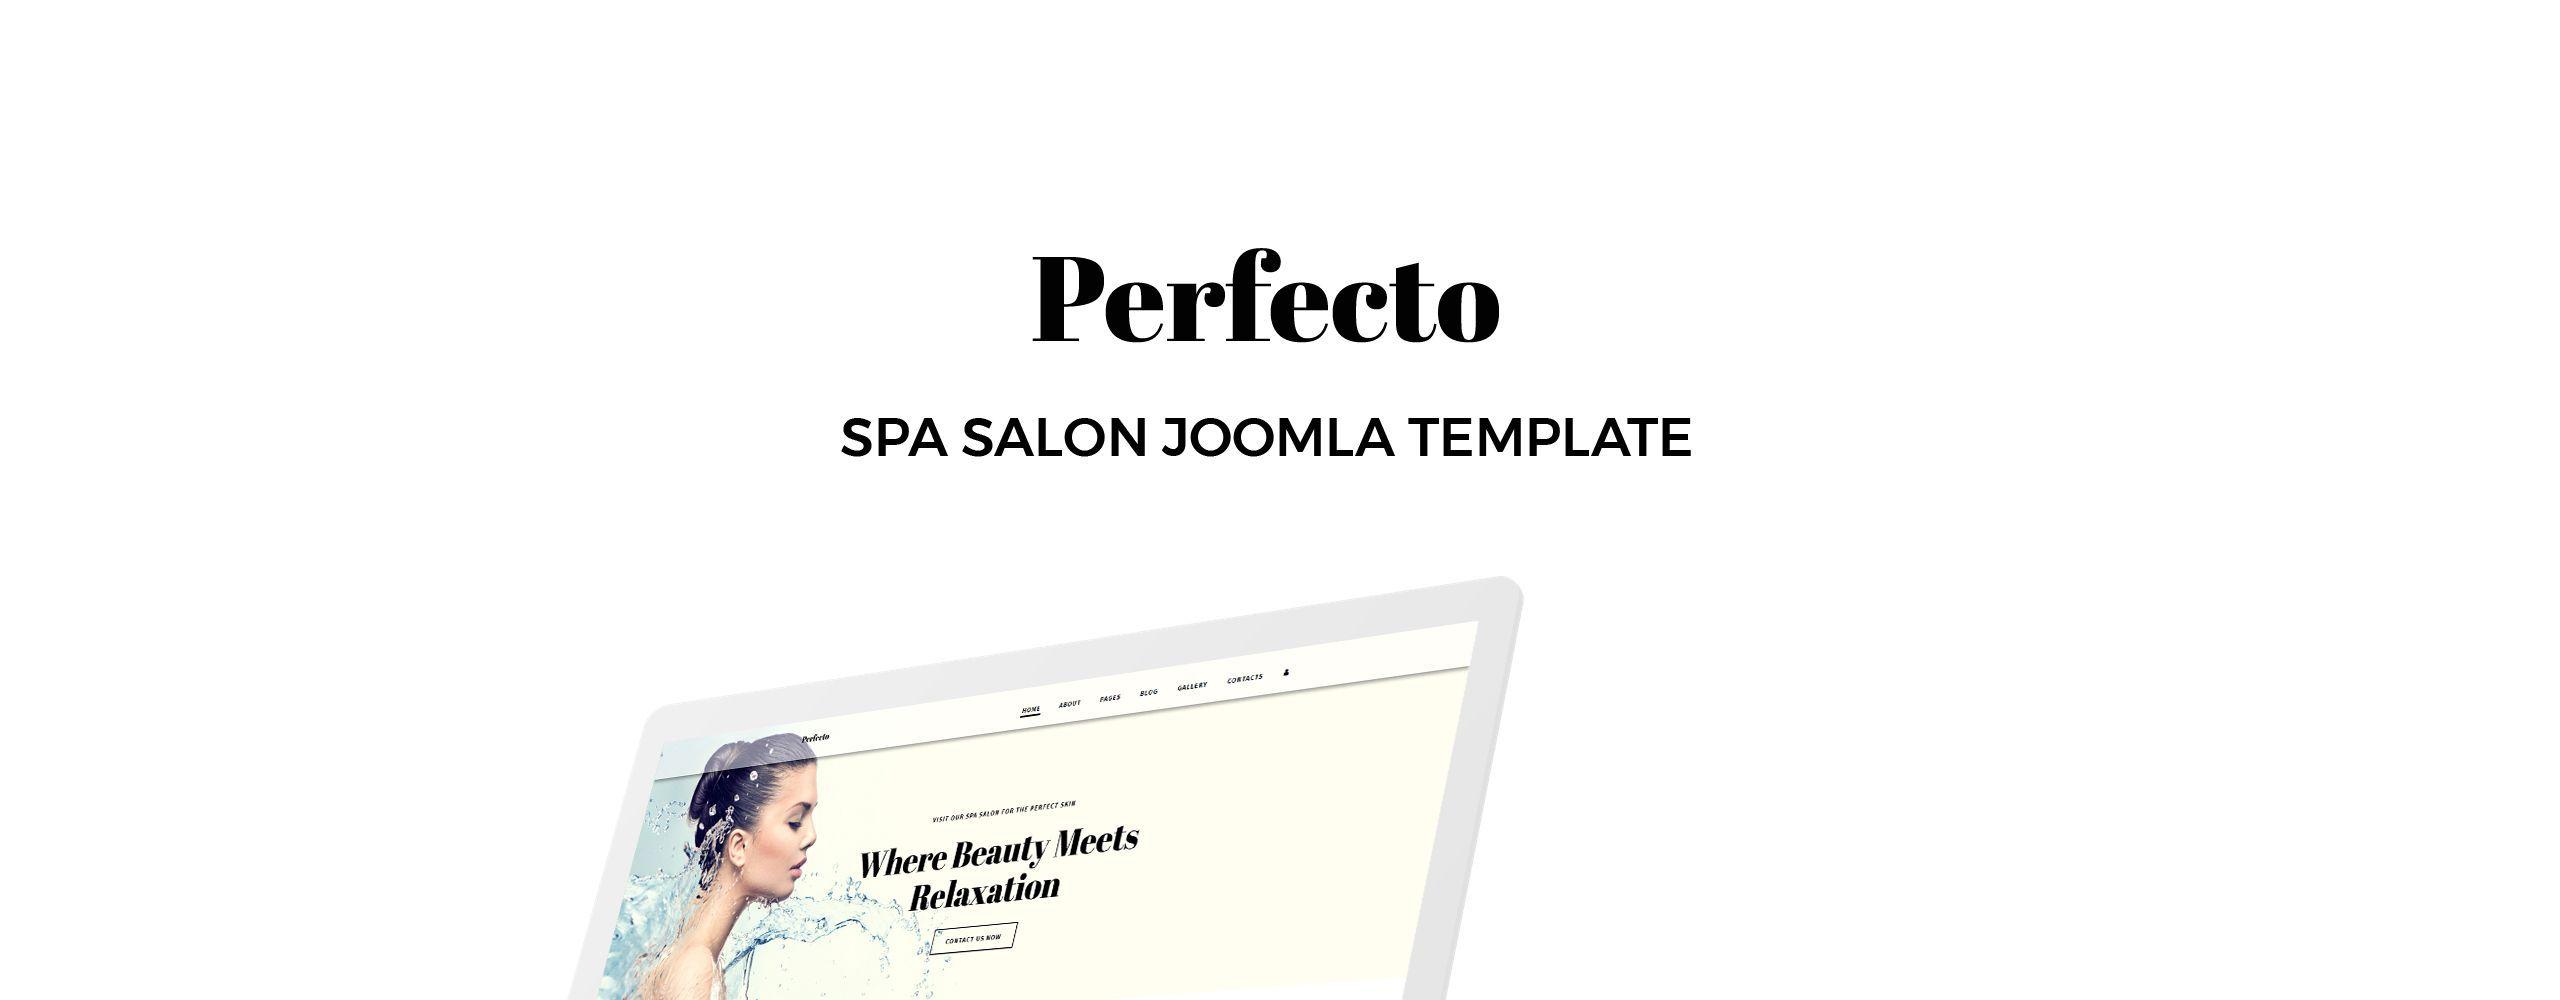 Perfecto Spa Salon Joomla Template  Joomla Templates  Ideas of Joomla Templates  Perfecto Spa Salon Joomla Template